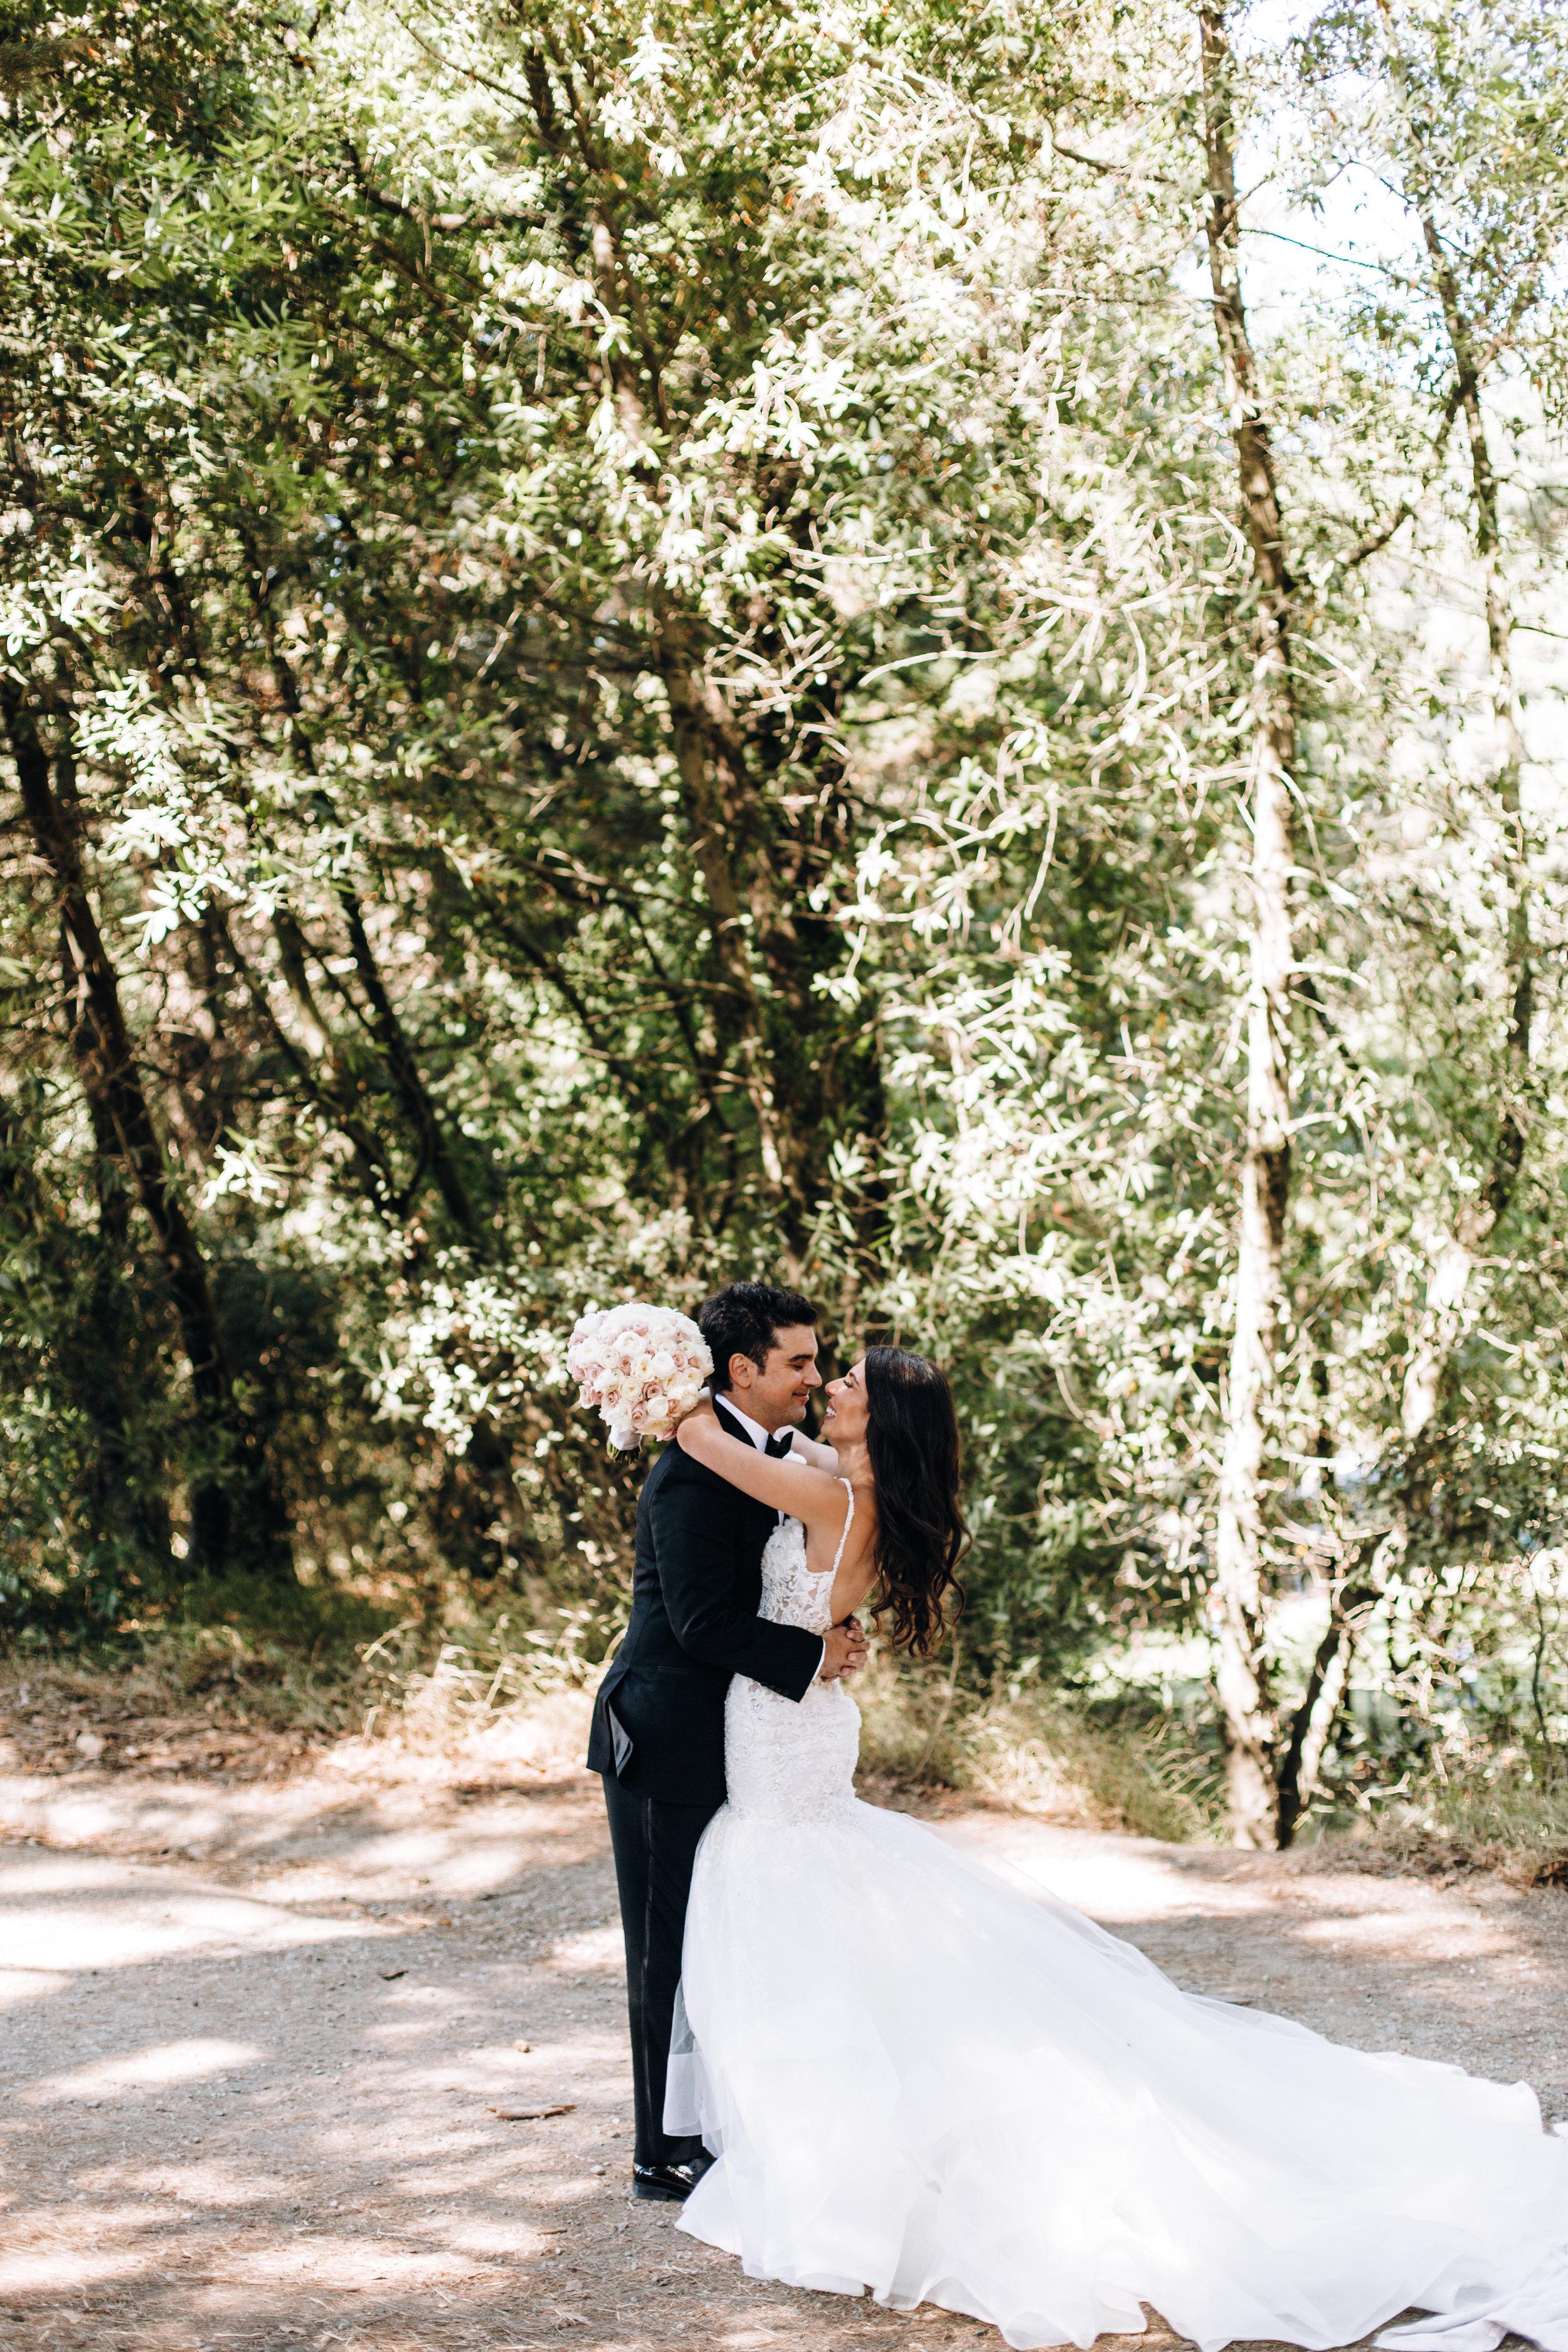 KaraNixonWeddings-GreekOrthodox-Oakland-Wedding-15.jpg